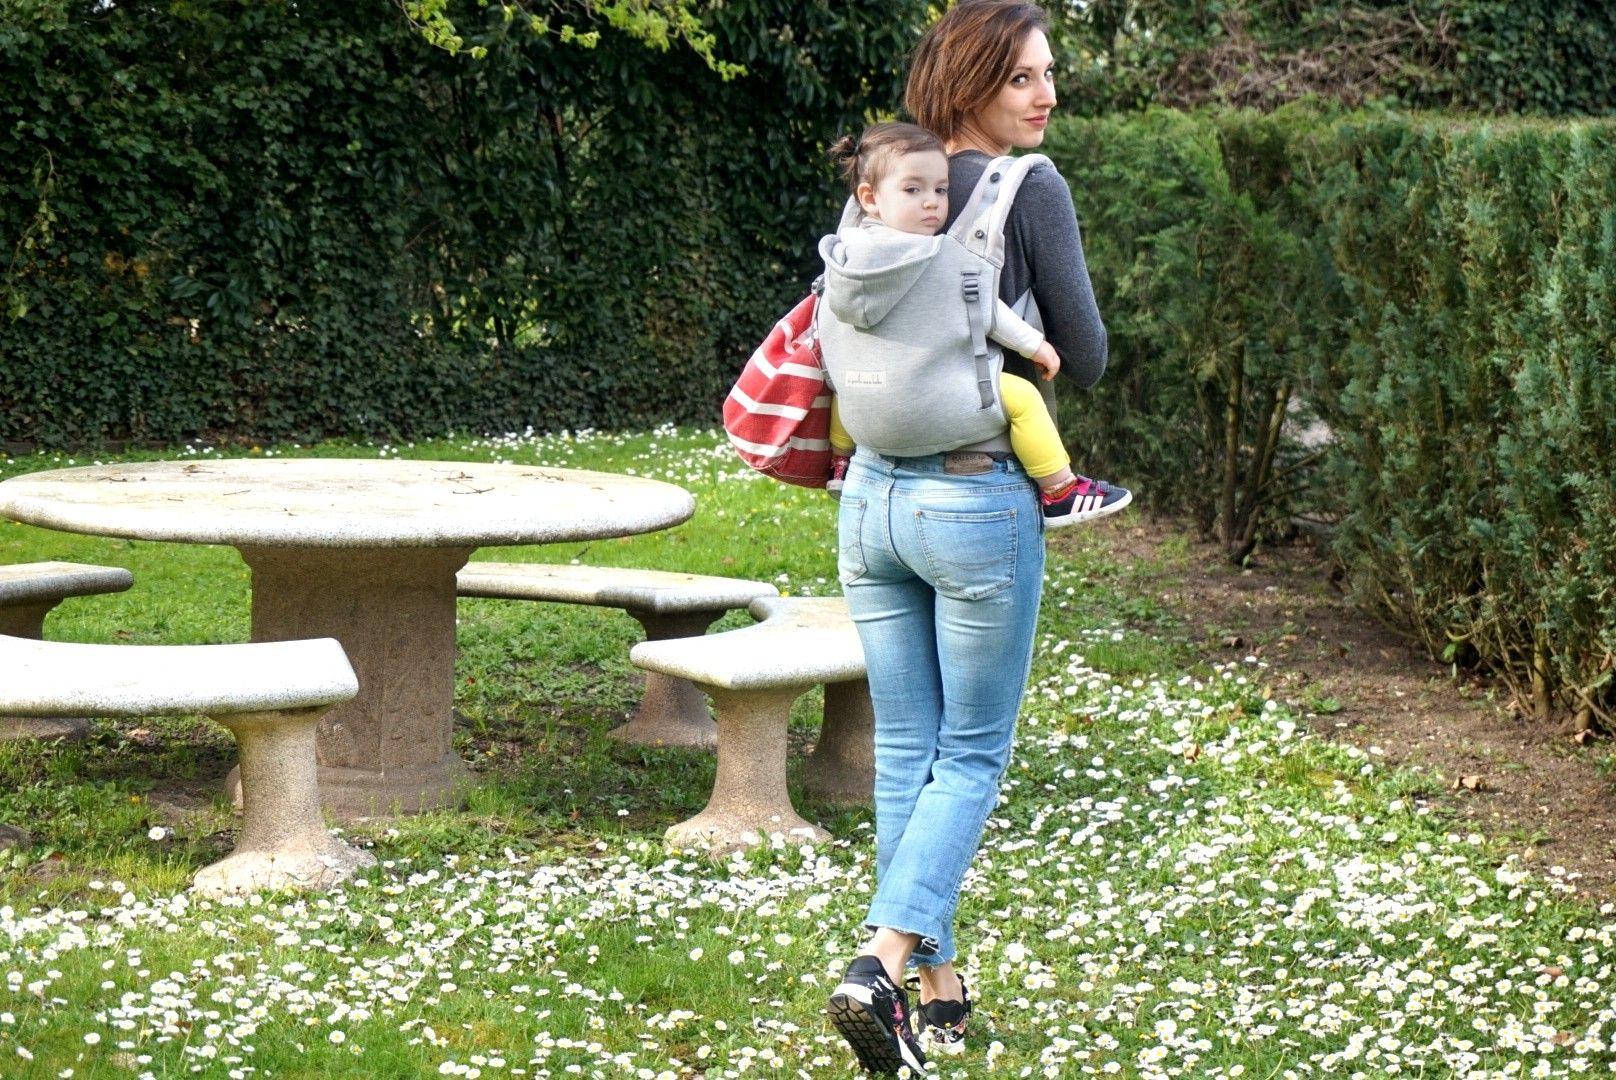 portage  jpmbb  echarpedeportage  portebebe  portagephysio   wearallthebabies  babygirl  babywearing 8b2b6009686